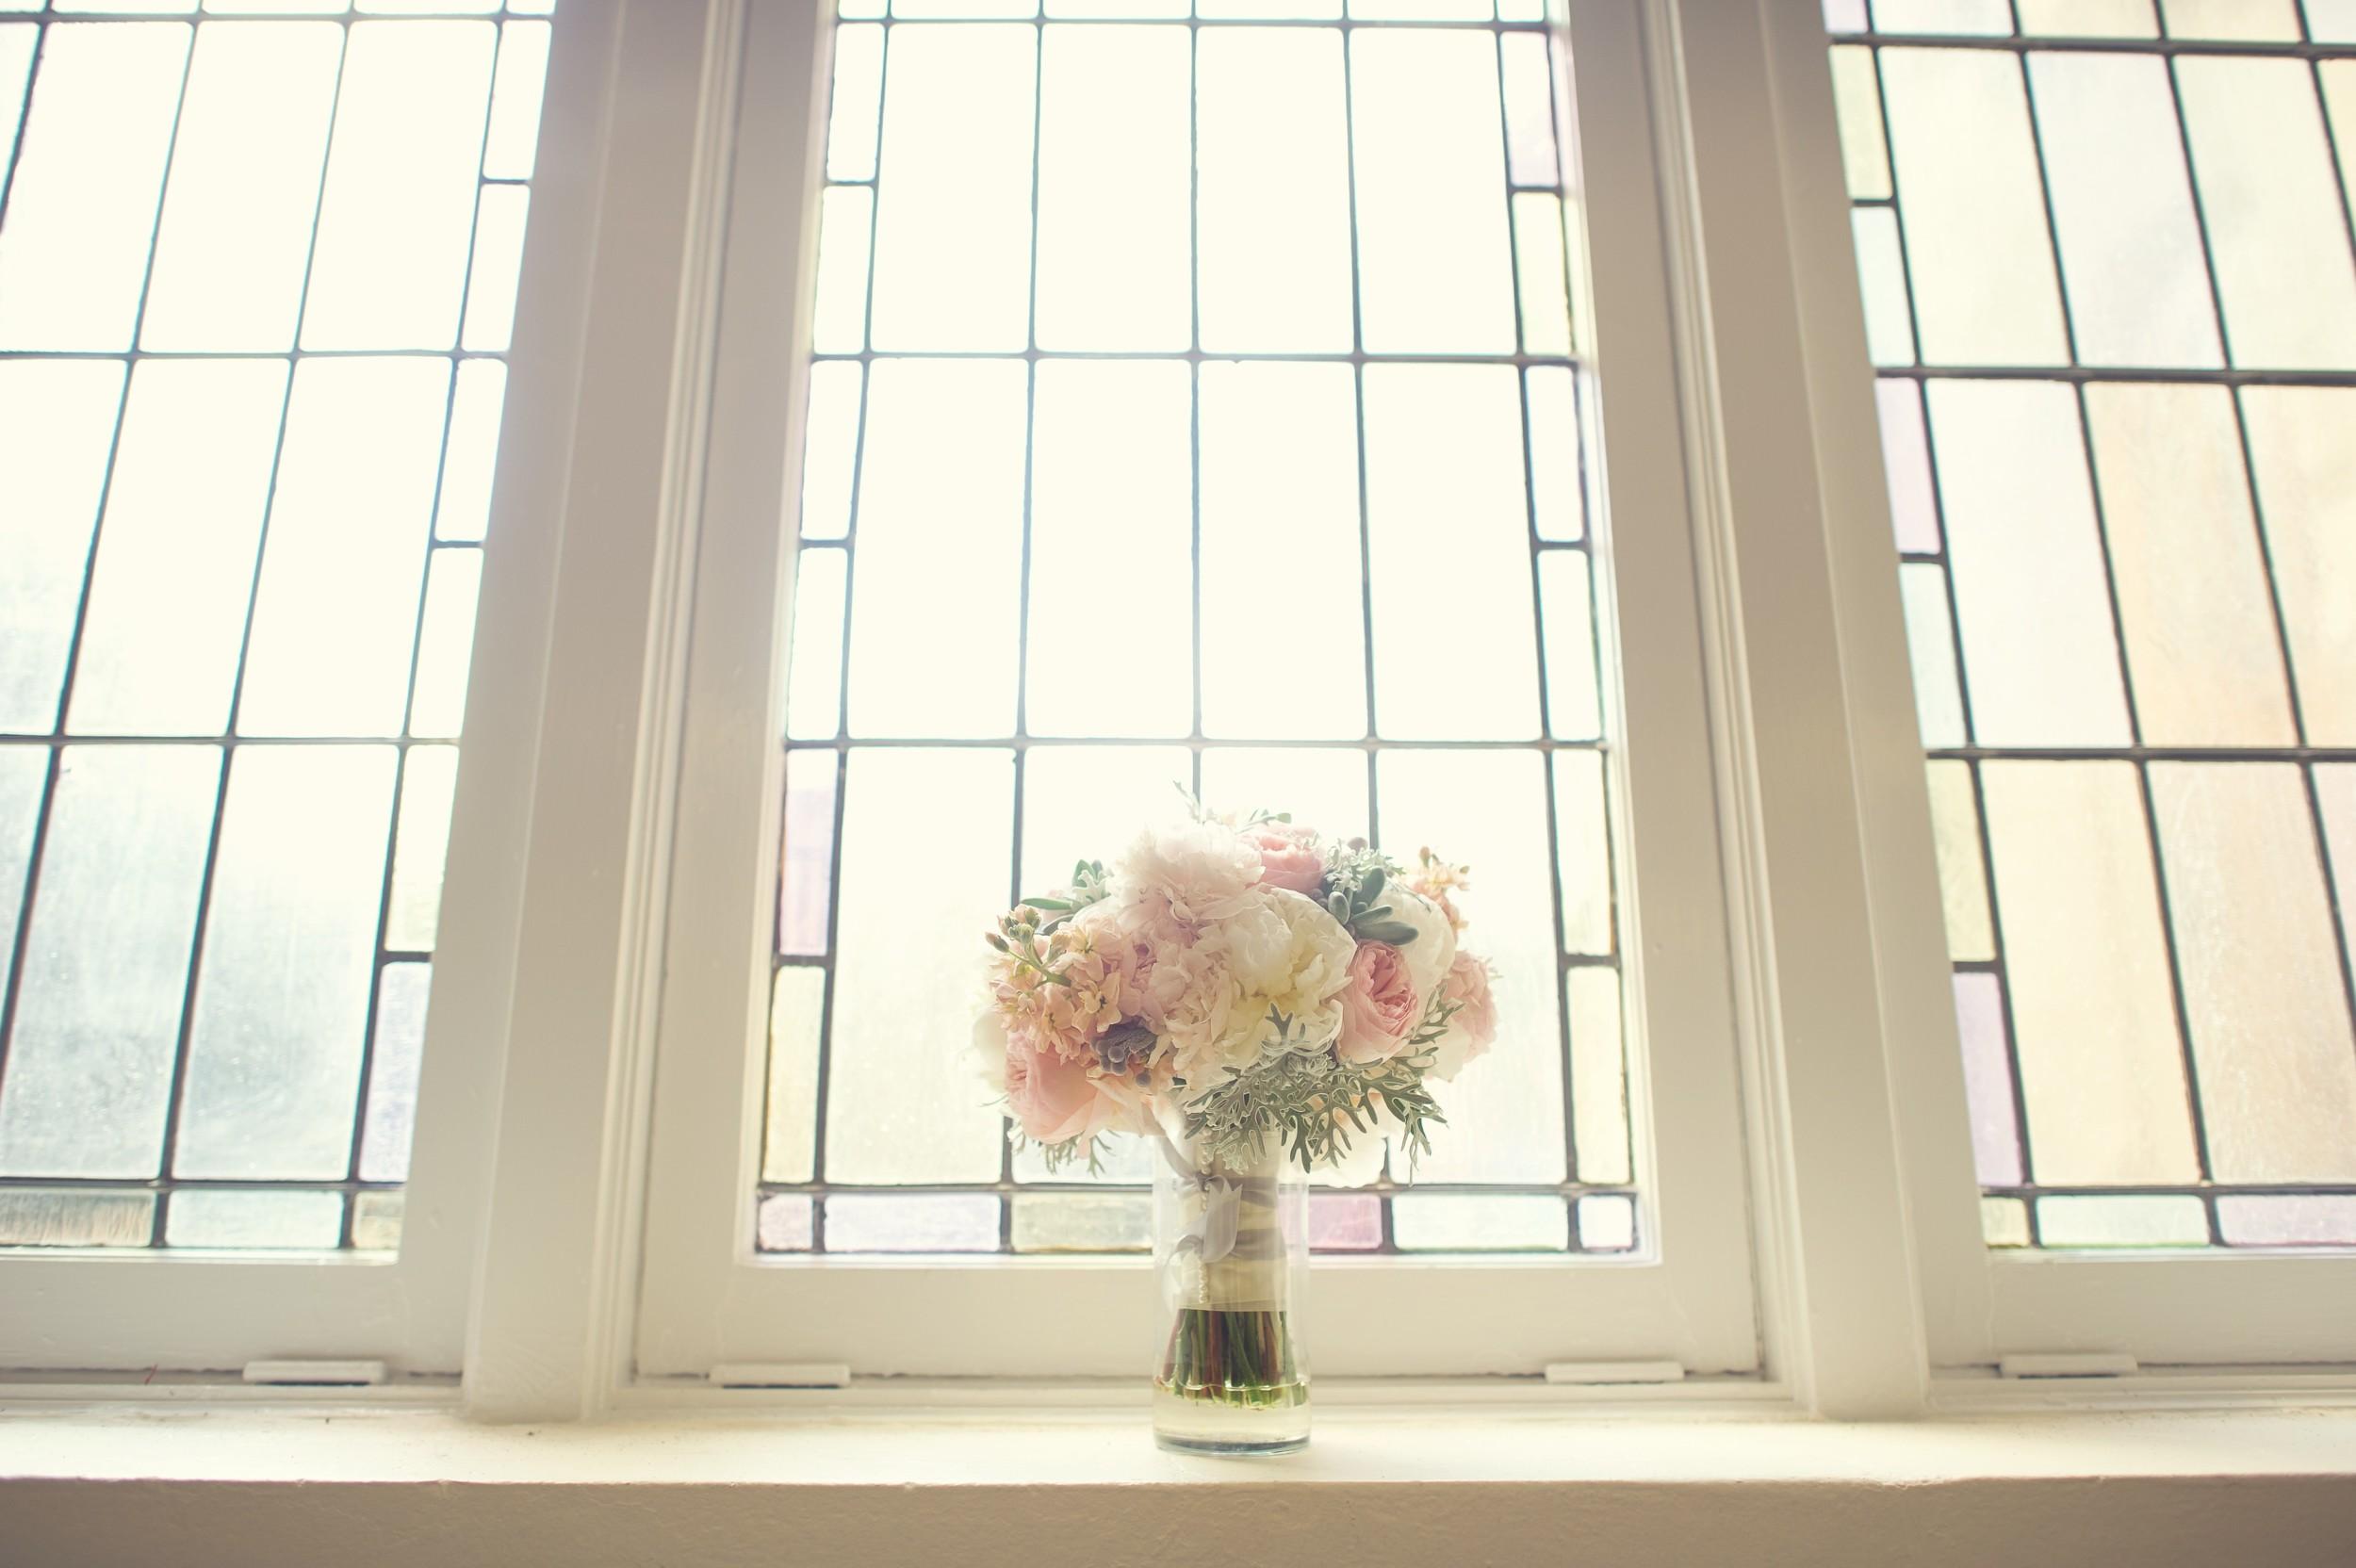 SOUTHERN WEDDING, THE GRACEFUL HOST, WEDDING PLANNER, CHARLOTTE WEDDING COORDINATOR, CHARLOTTE WEDDING PLANNER, SOUTHERN VINTAGE WEDDING DECOR, NORTH CAROLINA WEDDING PLANNER, NORTH CAROLINA WEDDING, CHARLOTTE WEDDING, CHARLOTTE BRIDE, CHARLOTTE WEDDING